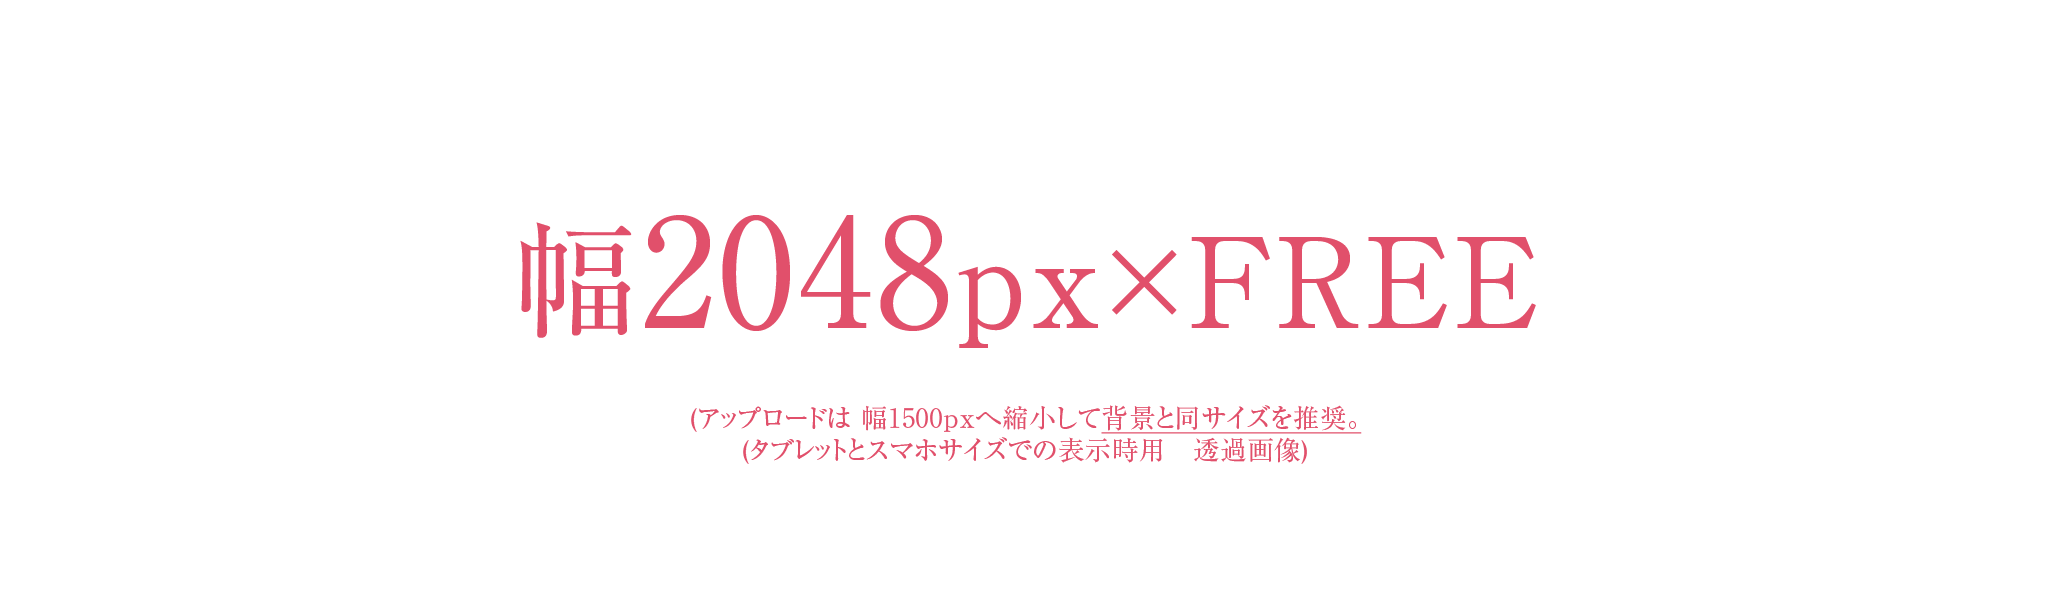 2048-free-tab-sp